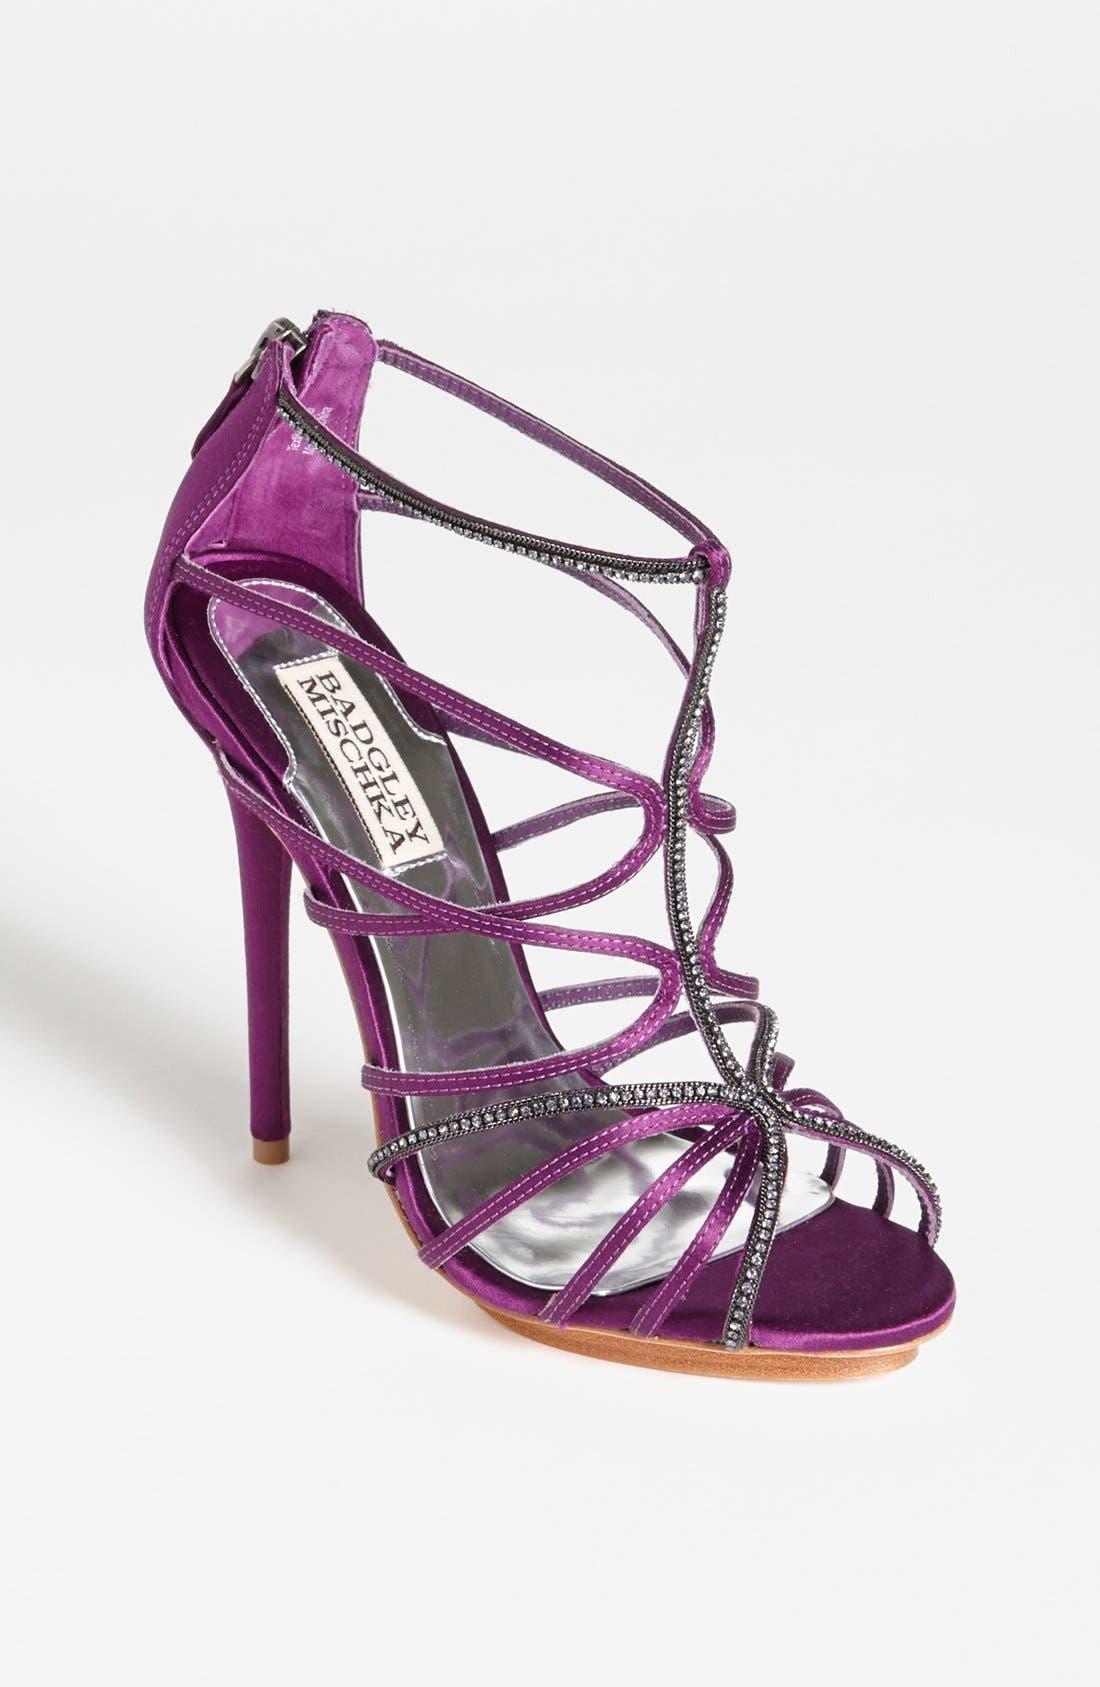 Main Image - Badgley Mischka 'Nisha' Sandal